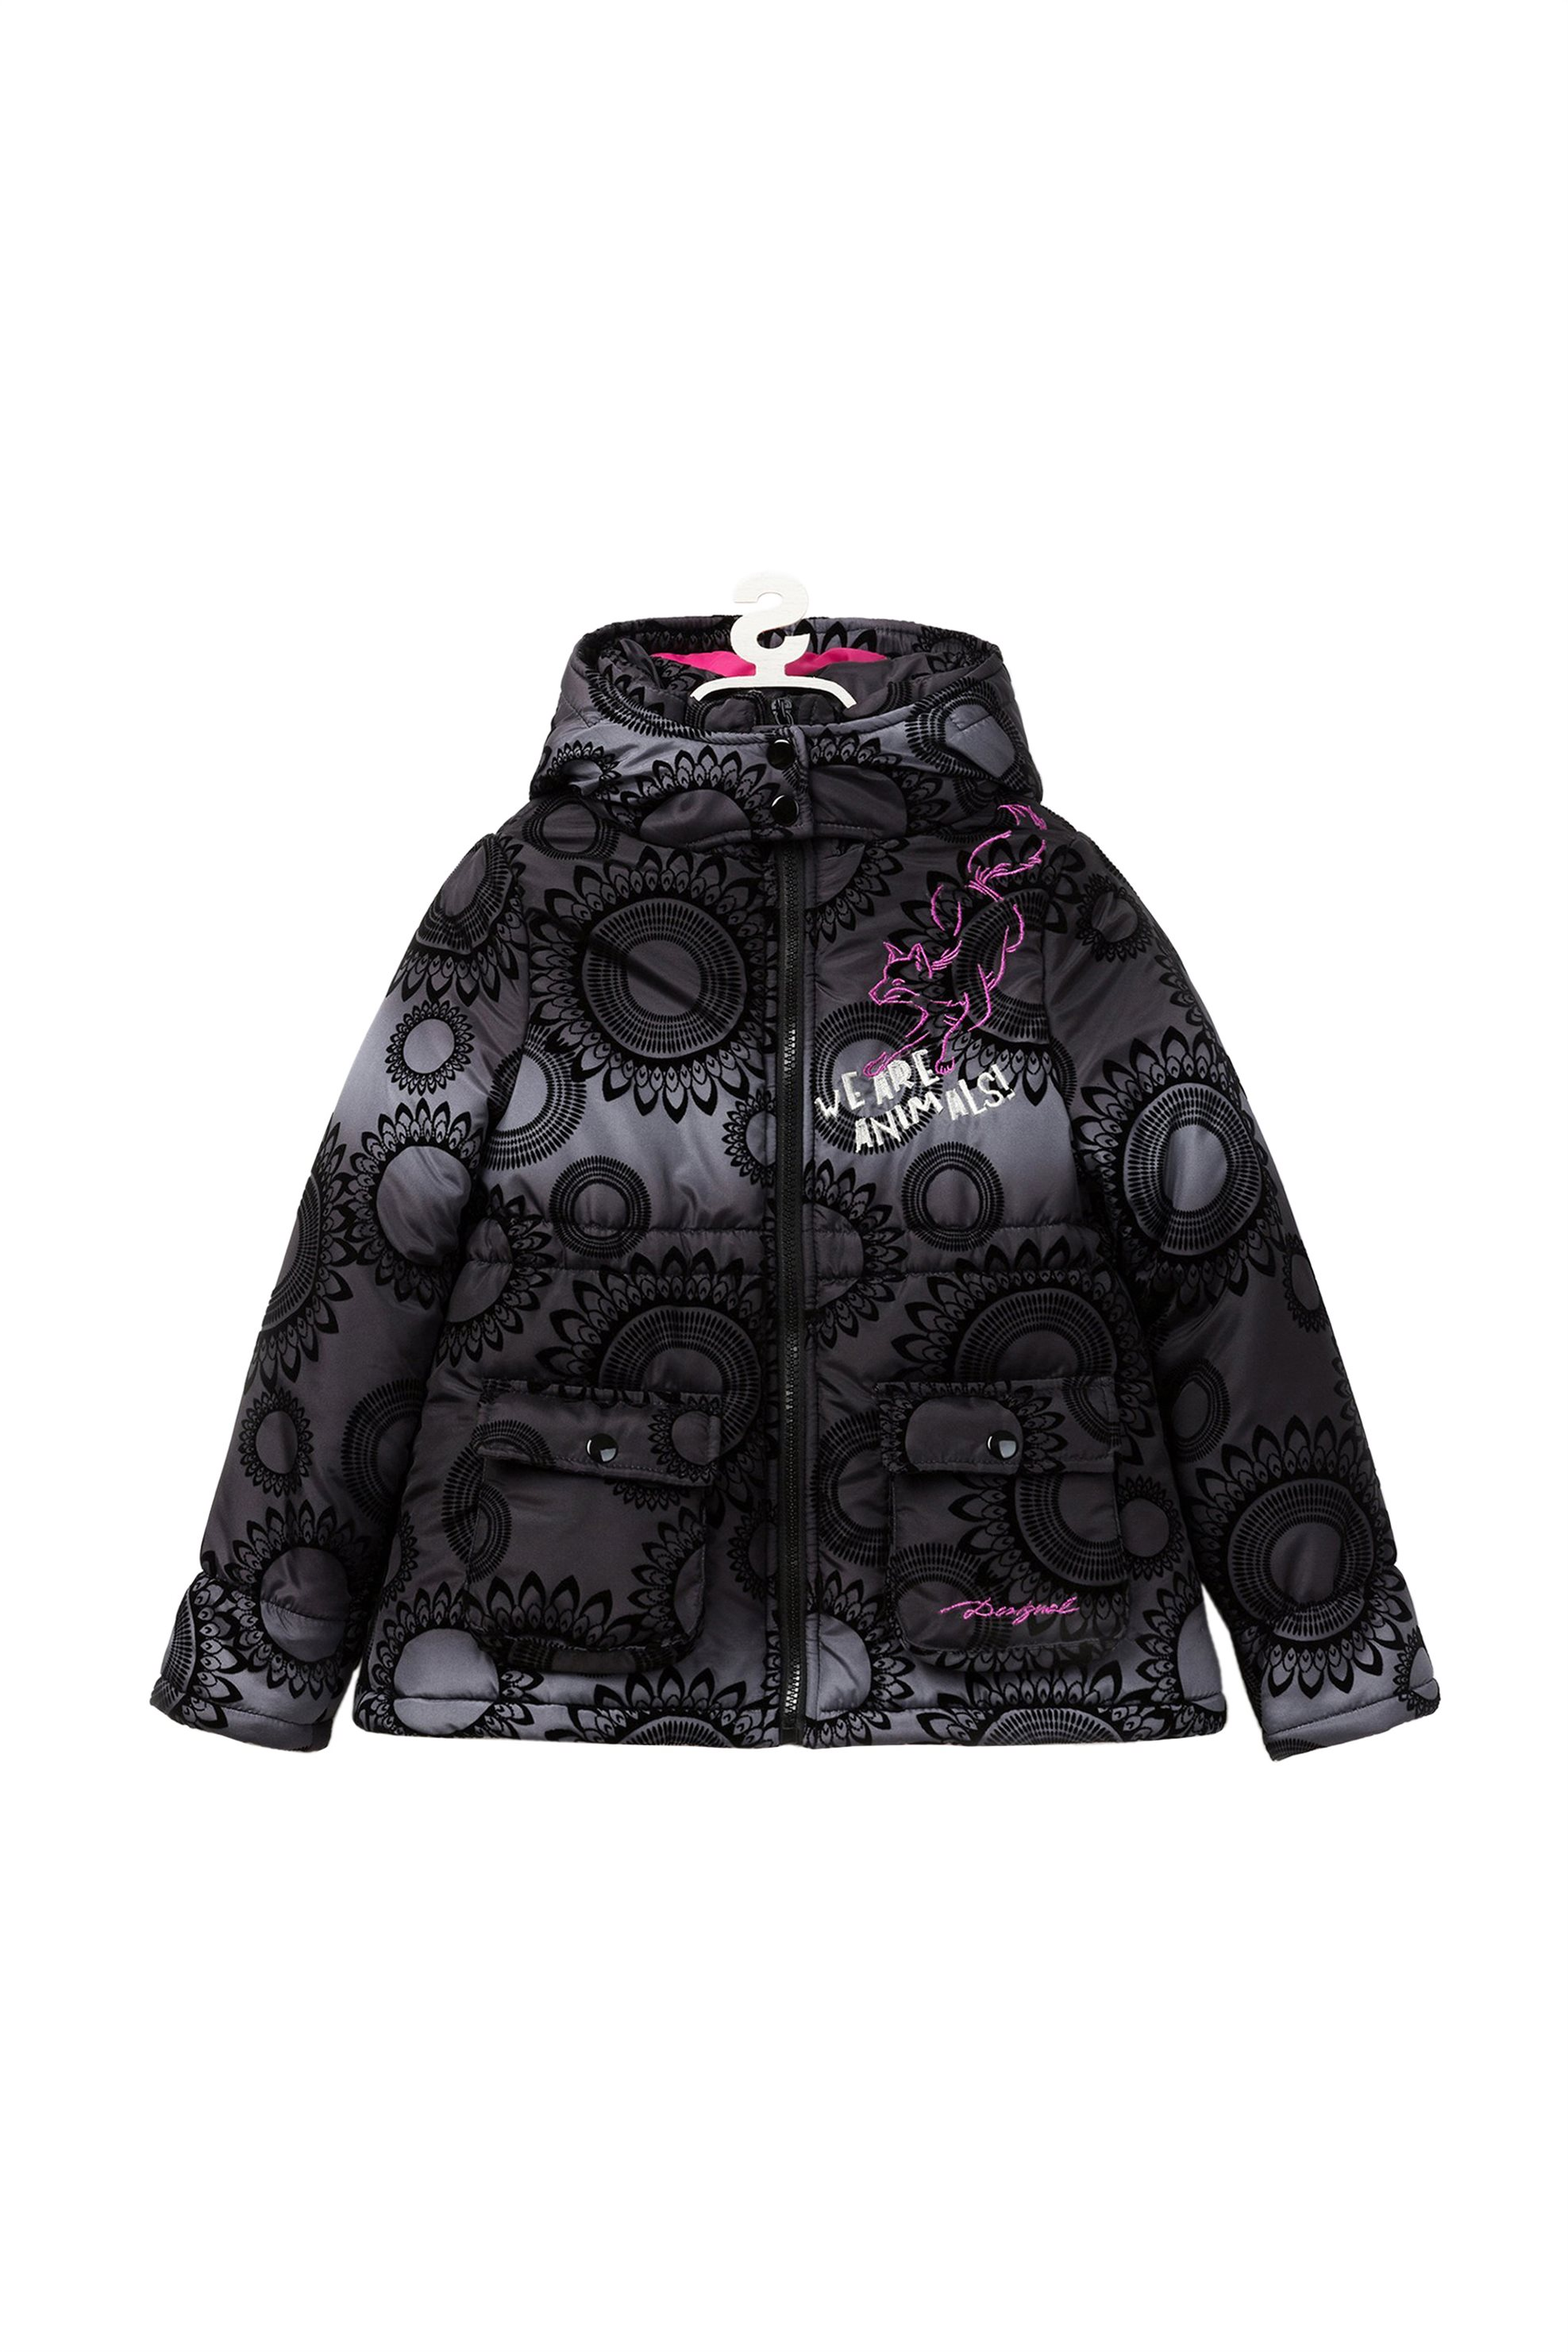 Notos Desigual παιδικό μπουφάν με κουκούλα - 18WGEW15 - Μαύρο 3a0035b0381